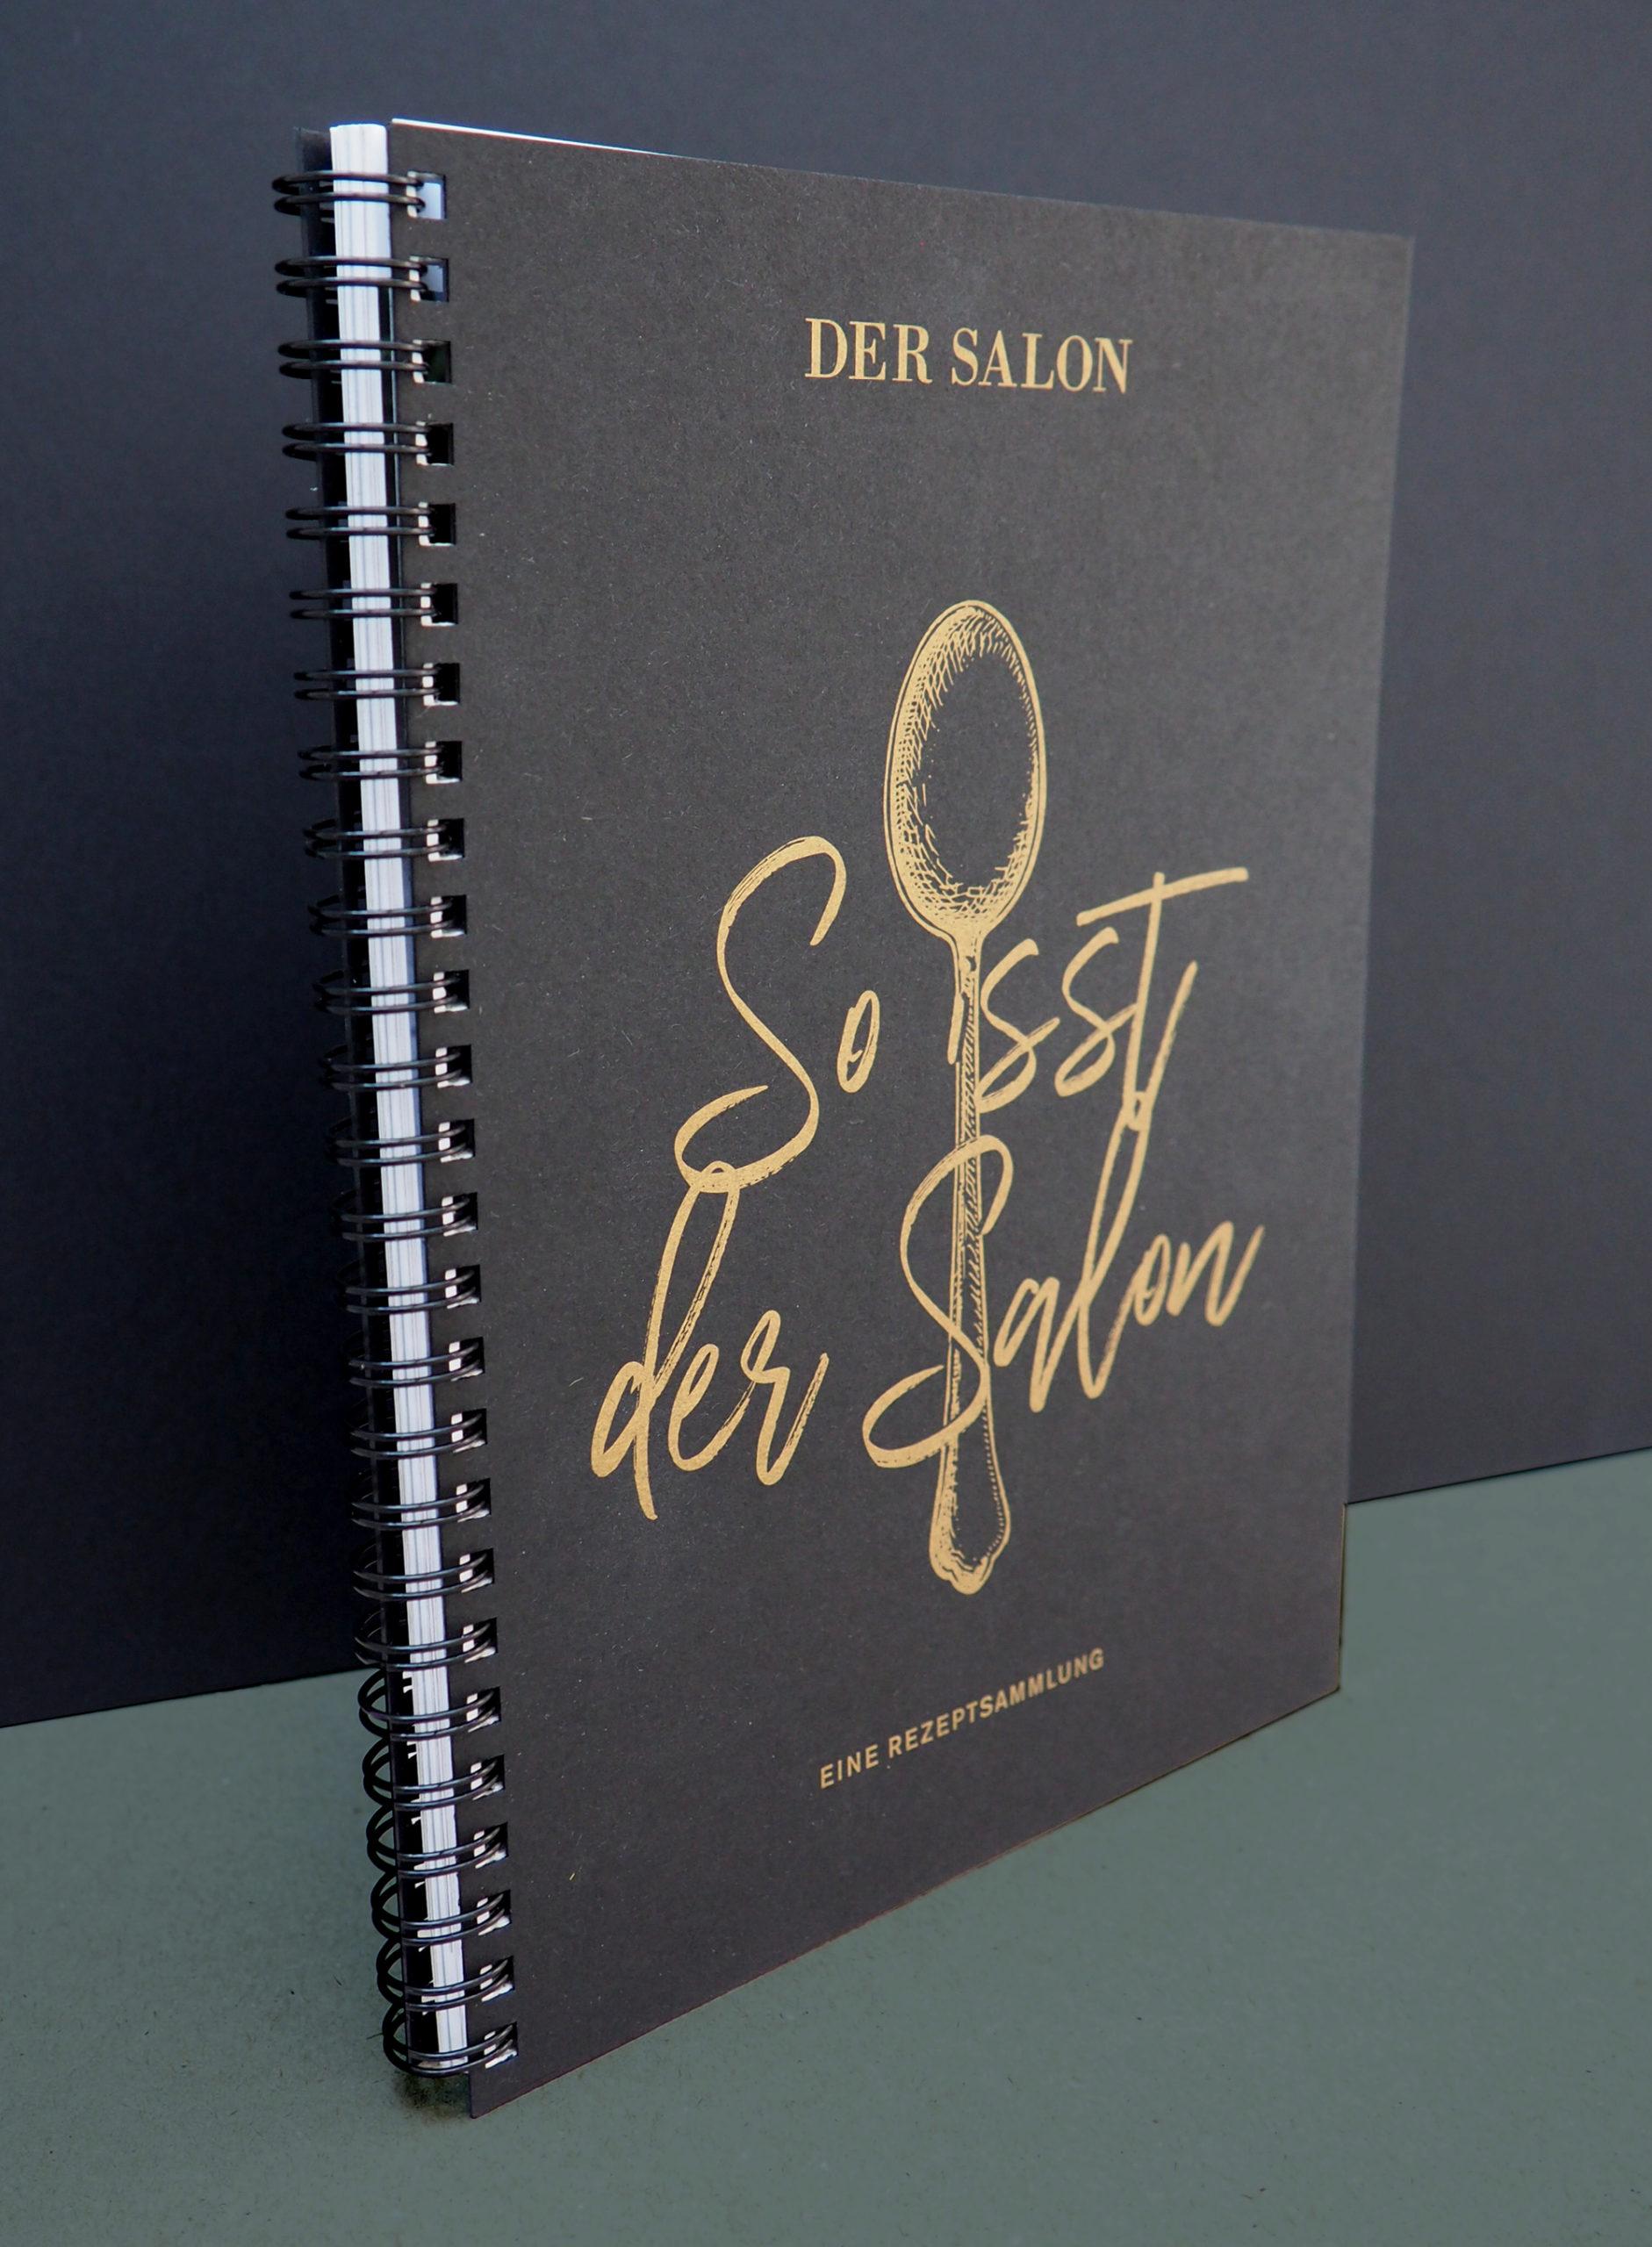 Studio dos, Grafikdesign Osnabrück, Der Salon Kochbuch Cover